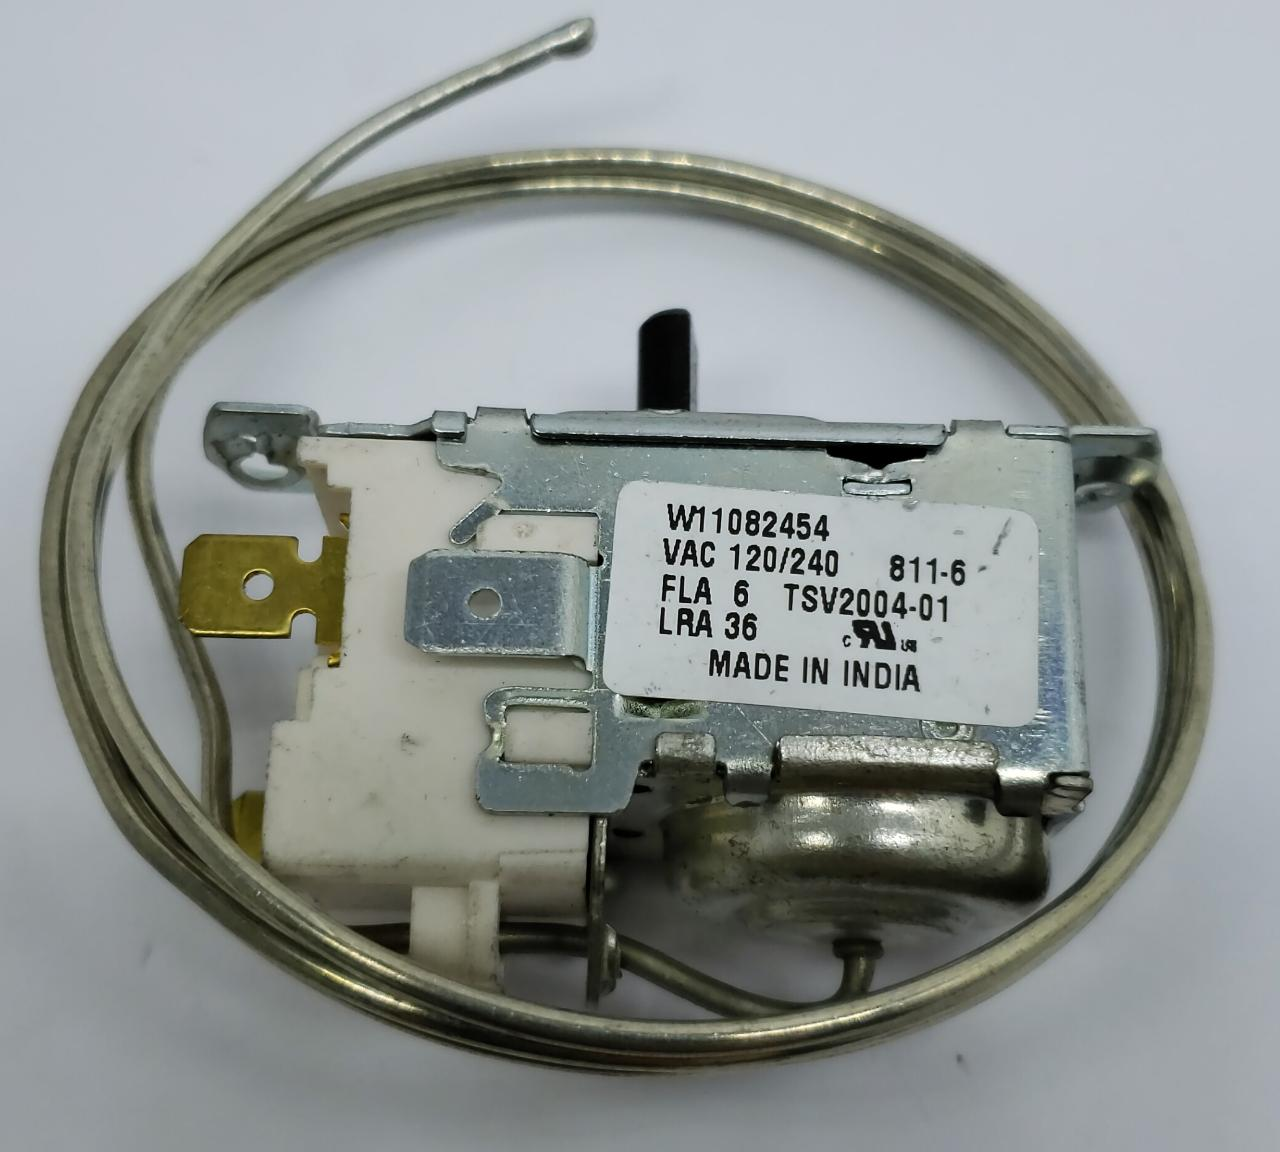 Termostato Freezer Consul Brastemp Tango 33 Tsv2004-01 Original W11082454